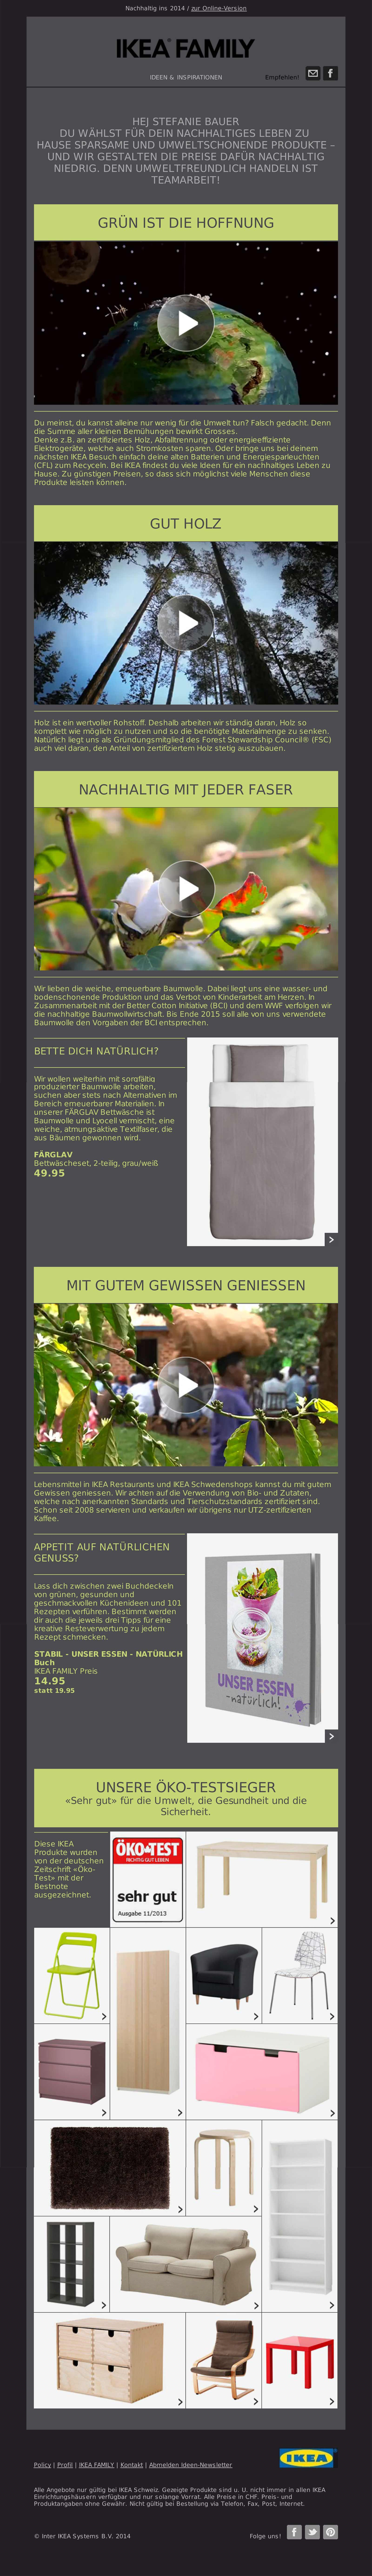 IKEA_Newsletter_INSL_NL_W3_long_slide